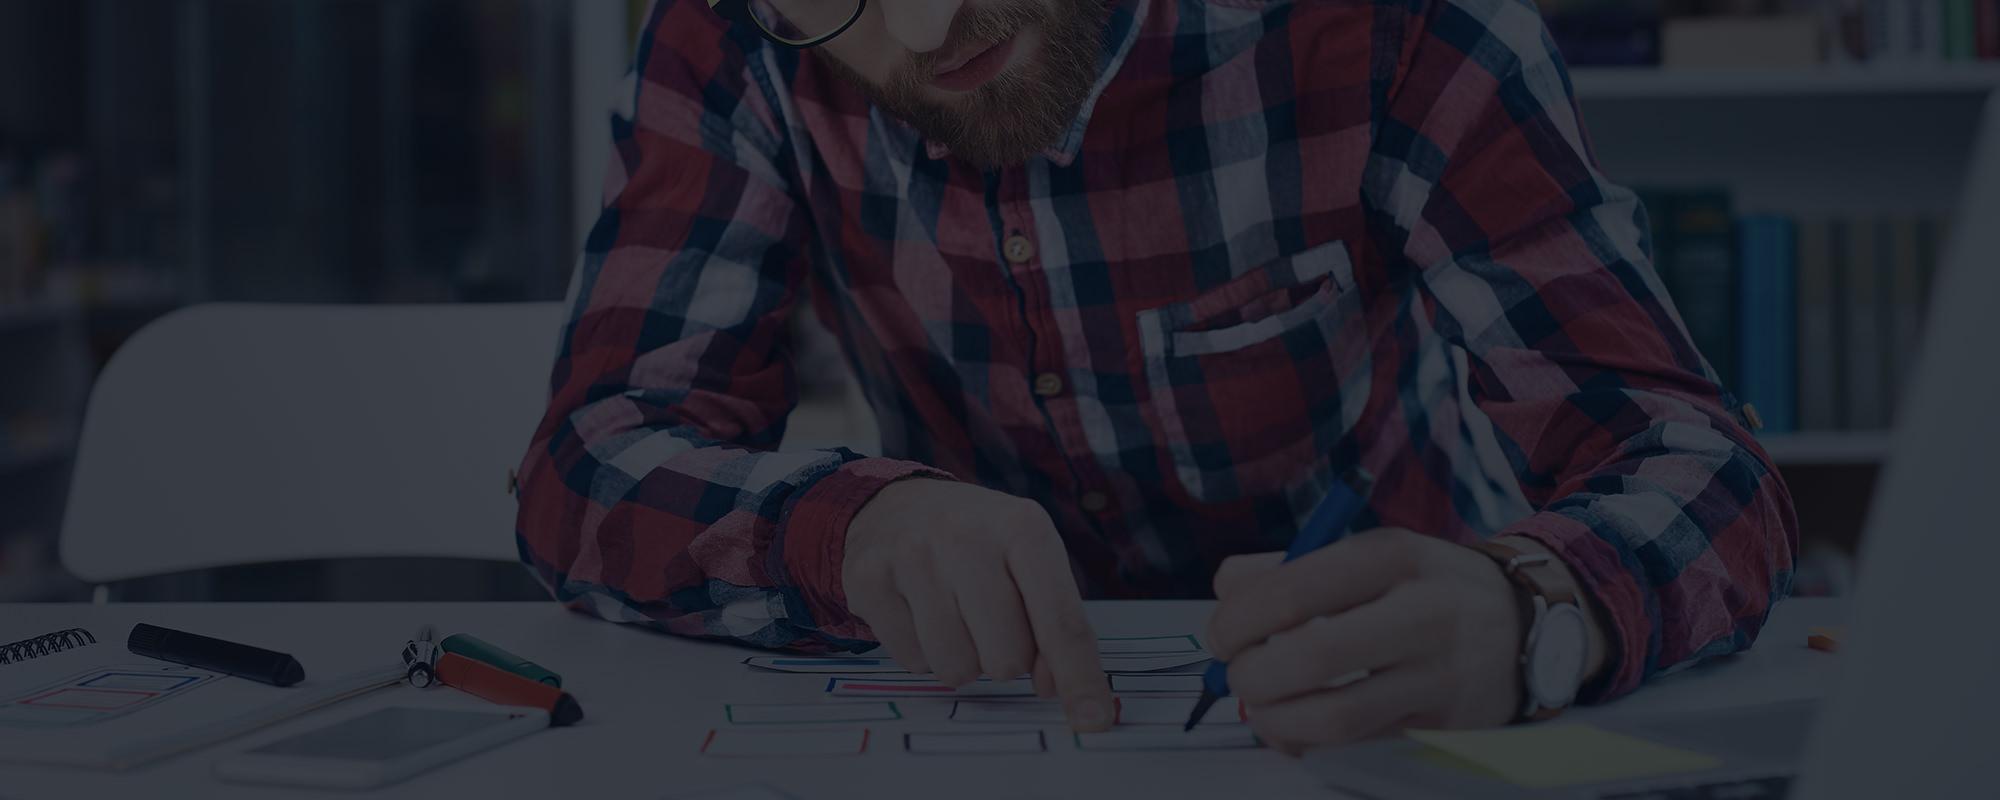 Website design being created